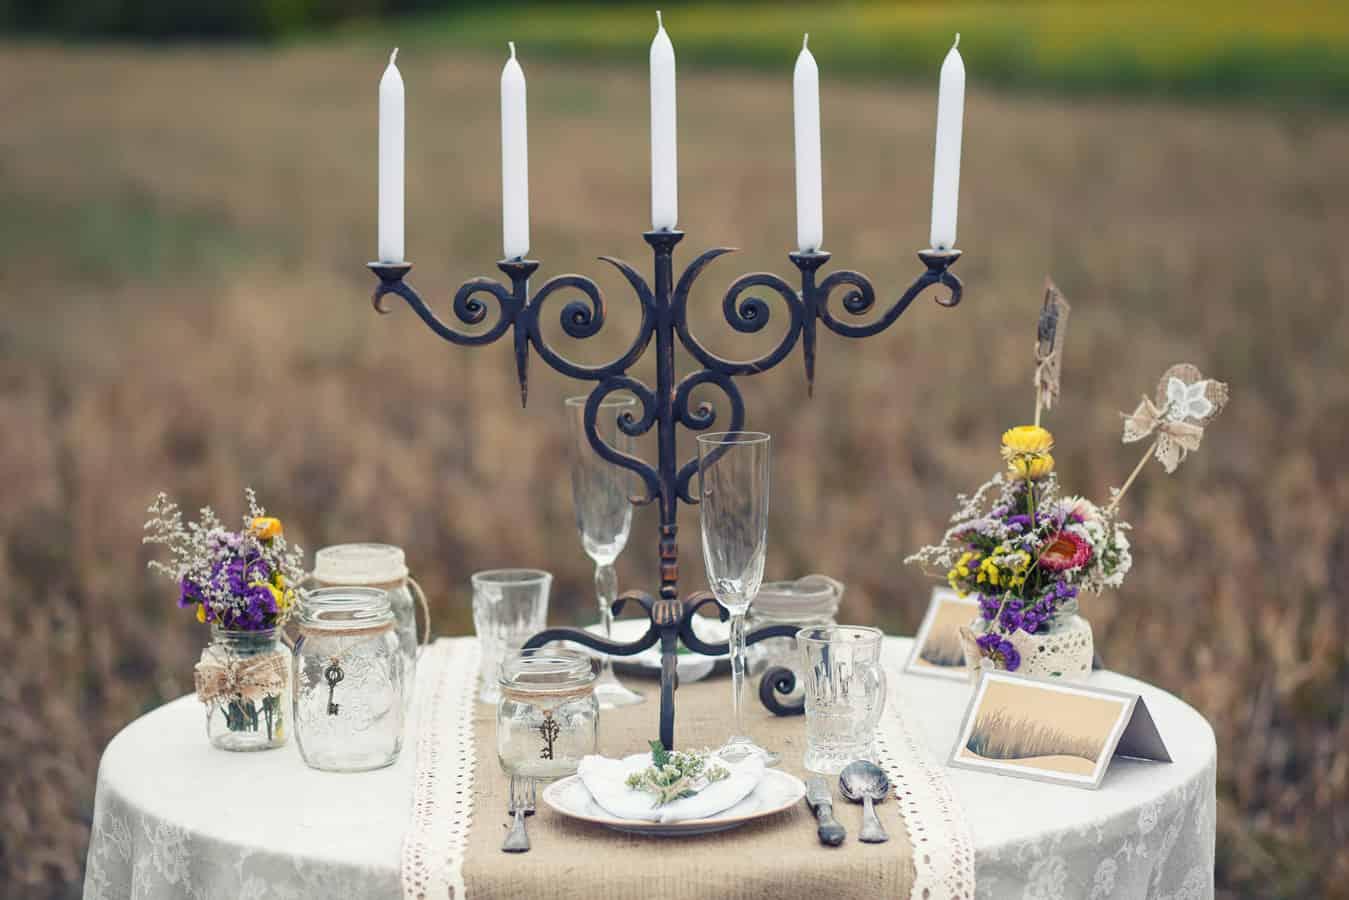 Bon ton femminilit e regole anche in tavola - Bon ton a tavola ...